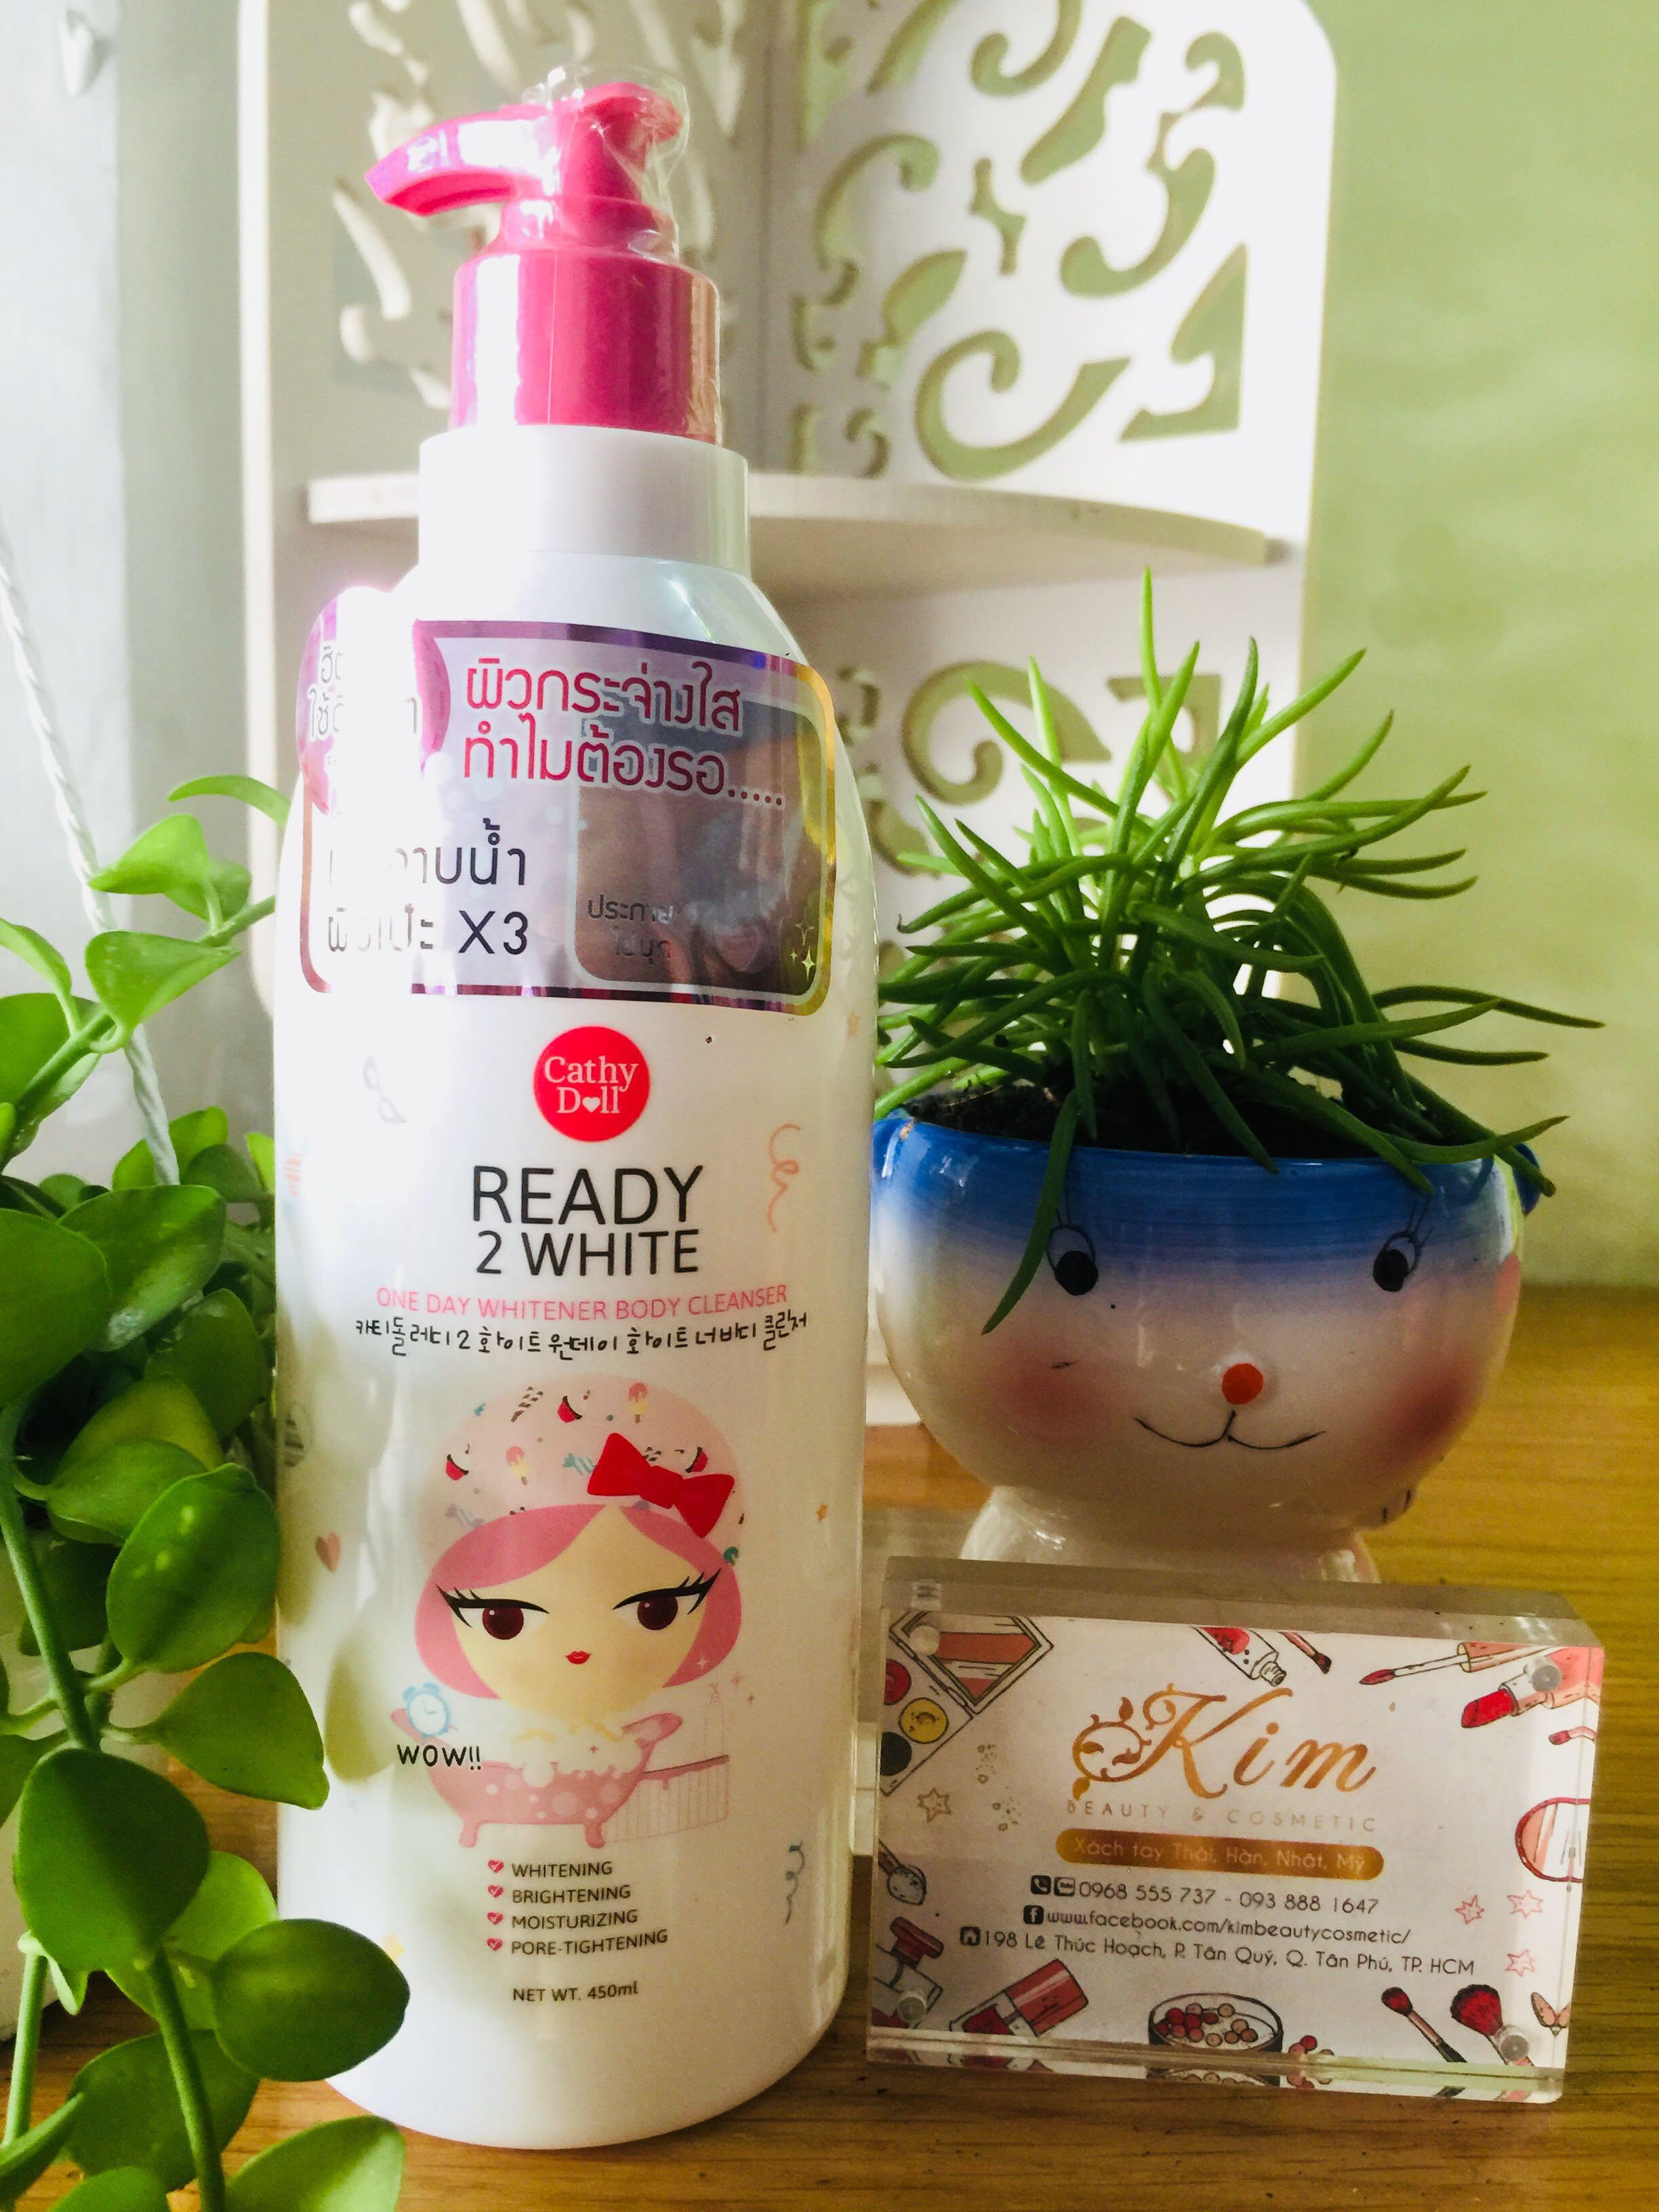 Lotion Duong Trang Da Cathy Doll Ready 2 White P Chnh Hng Cht Whitener Body 150ml Lng Gi R Hp Dn